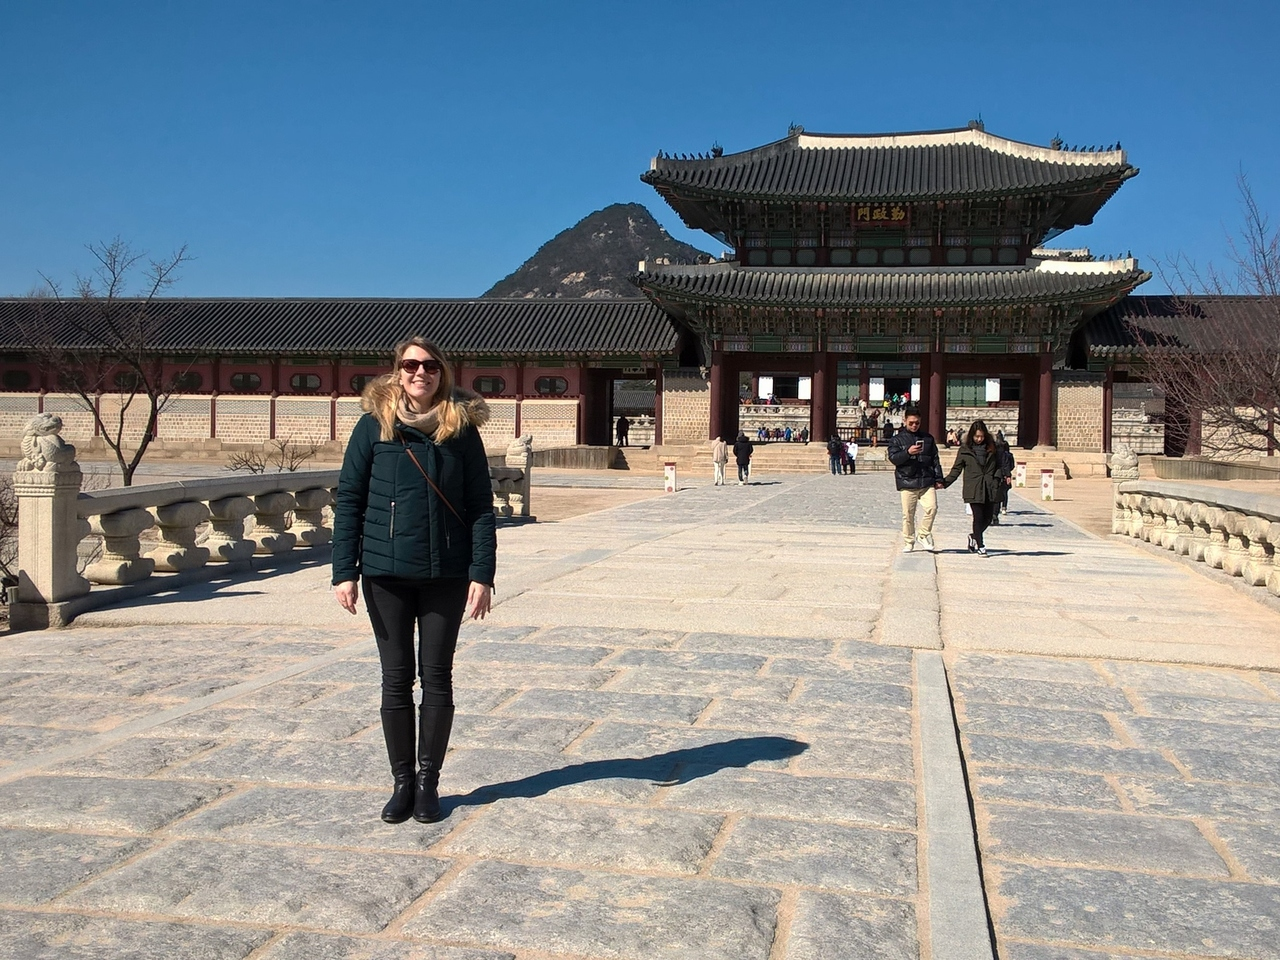 1. Gyeongbokgung Palace